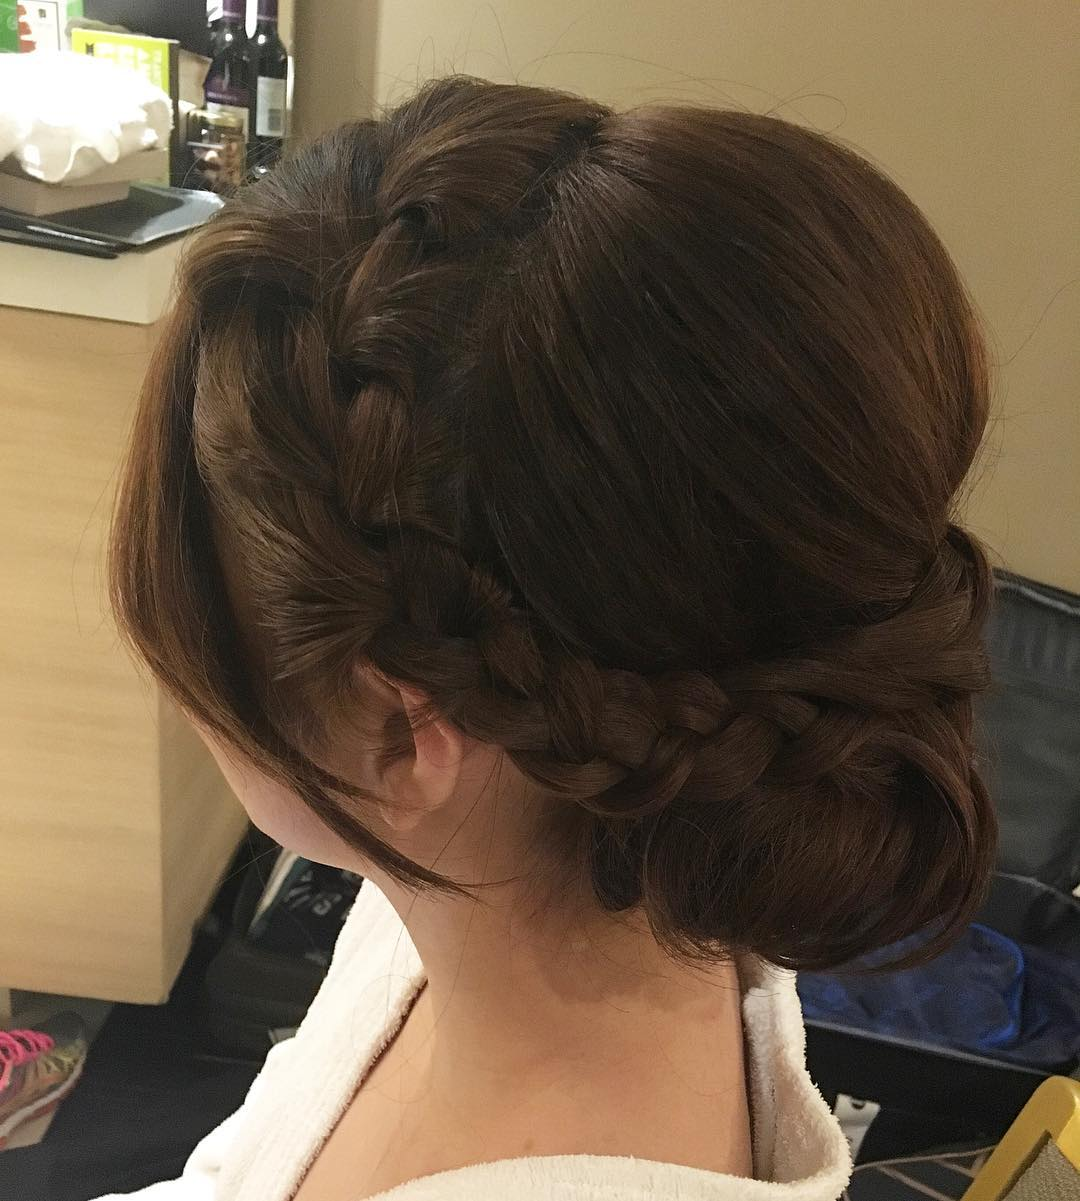 Classy Bridal Hairstyle Looks So Elegant